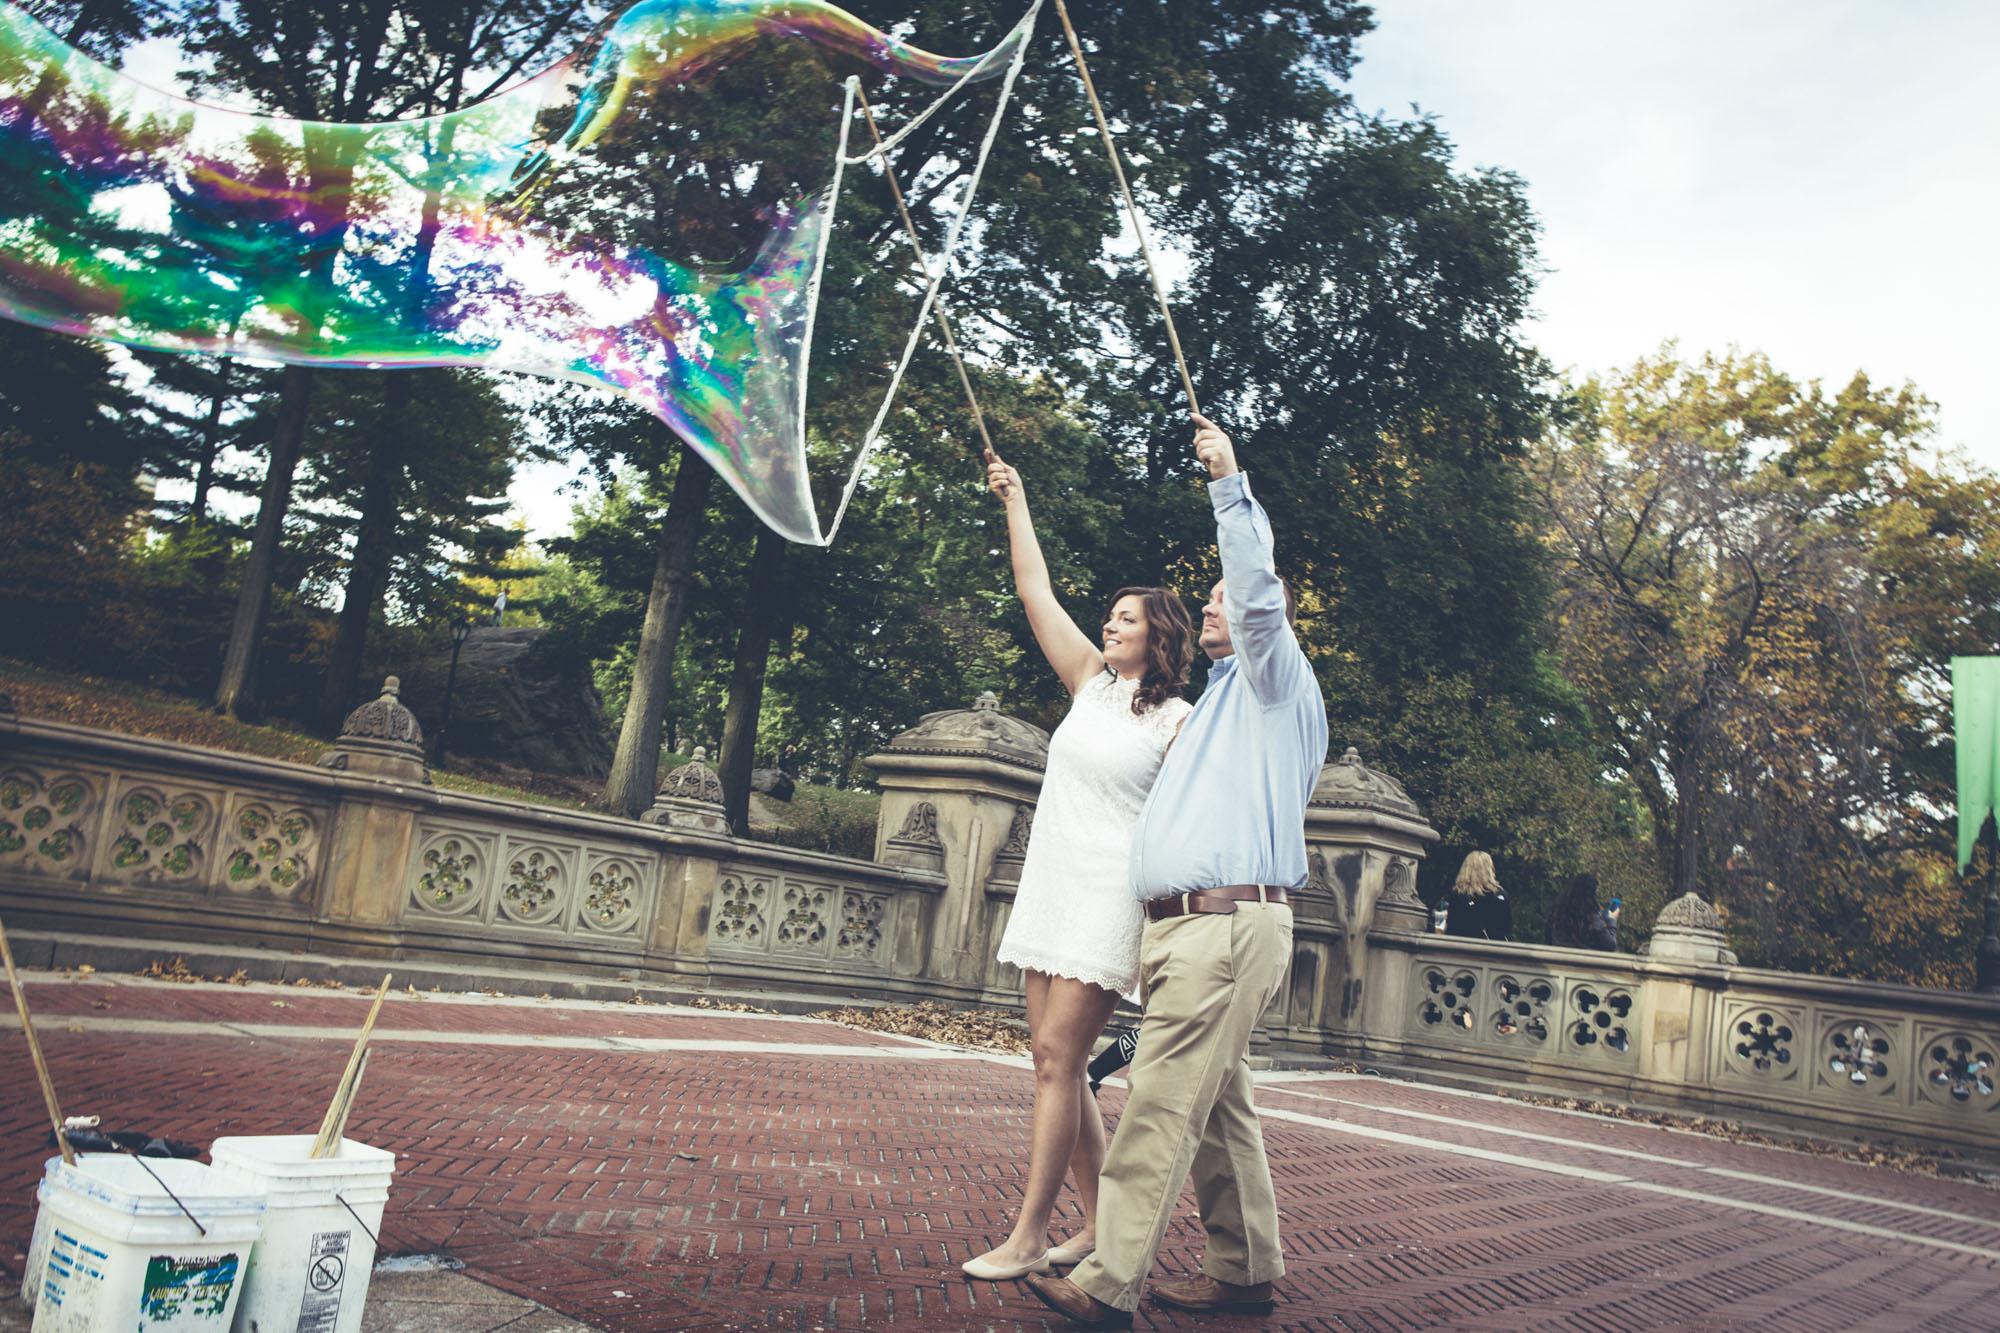 scranton_wedding_photographer_lettieri_pa (6 of 12).jpg